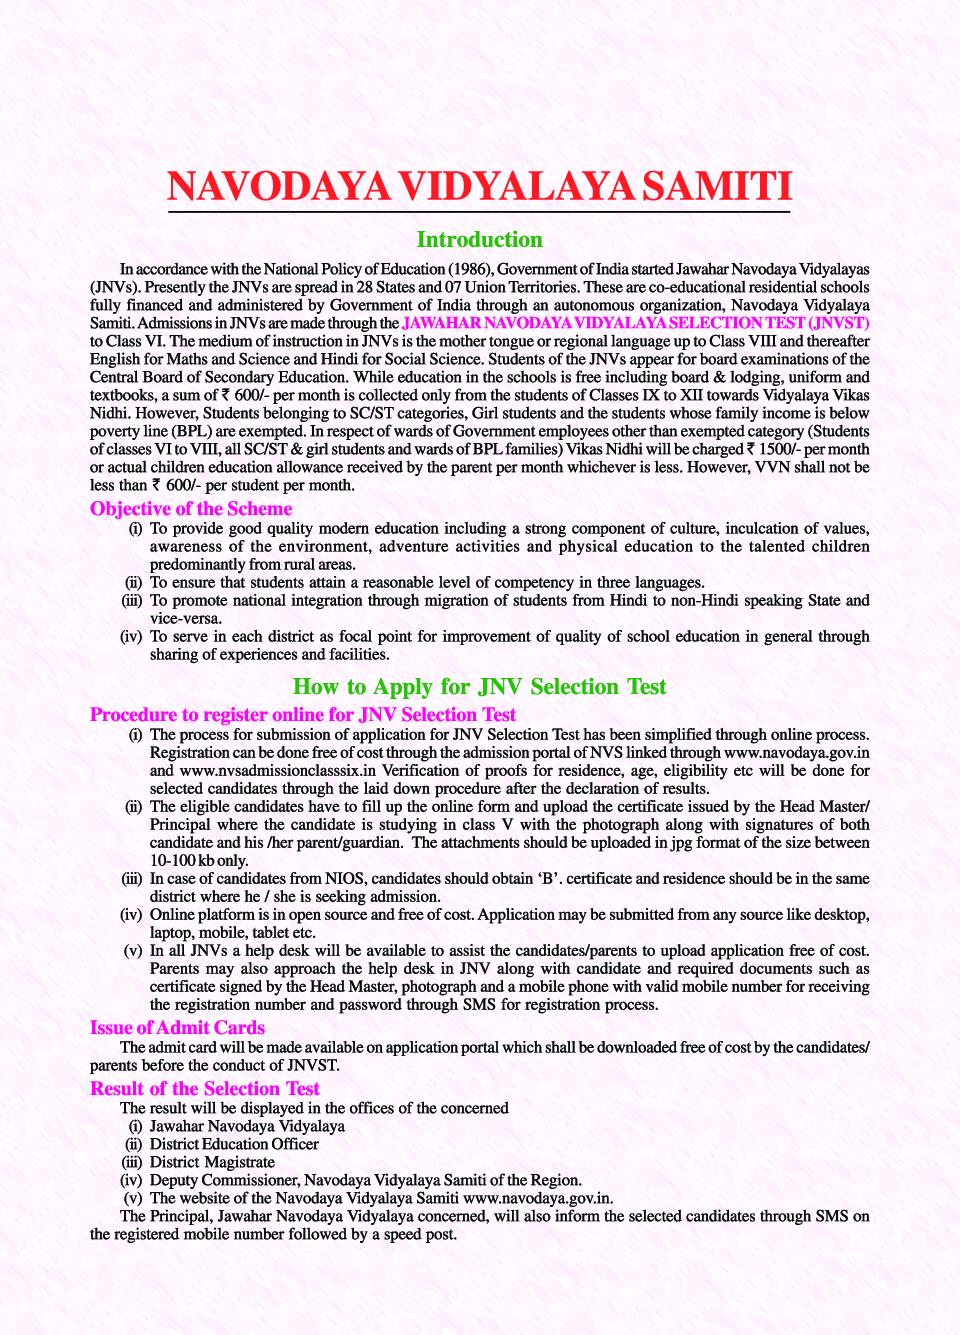 Navodaya Vidyalaya Entrance Exam For Class - VI - Page 5